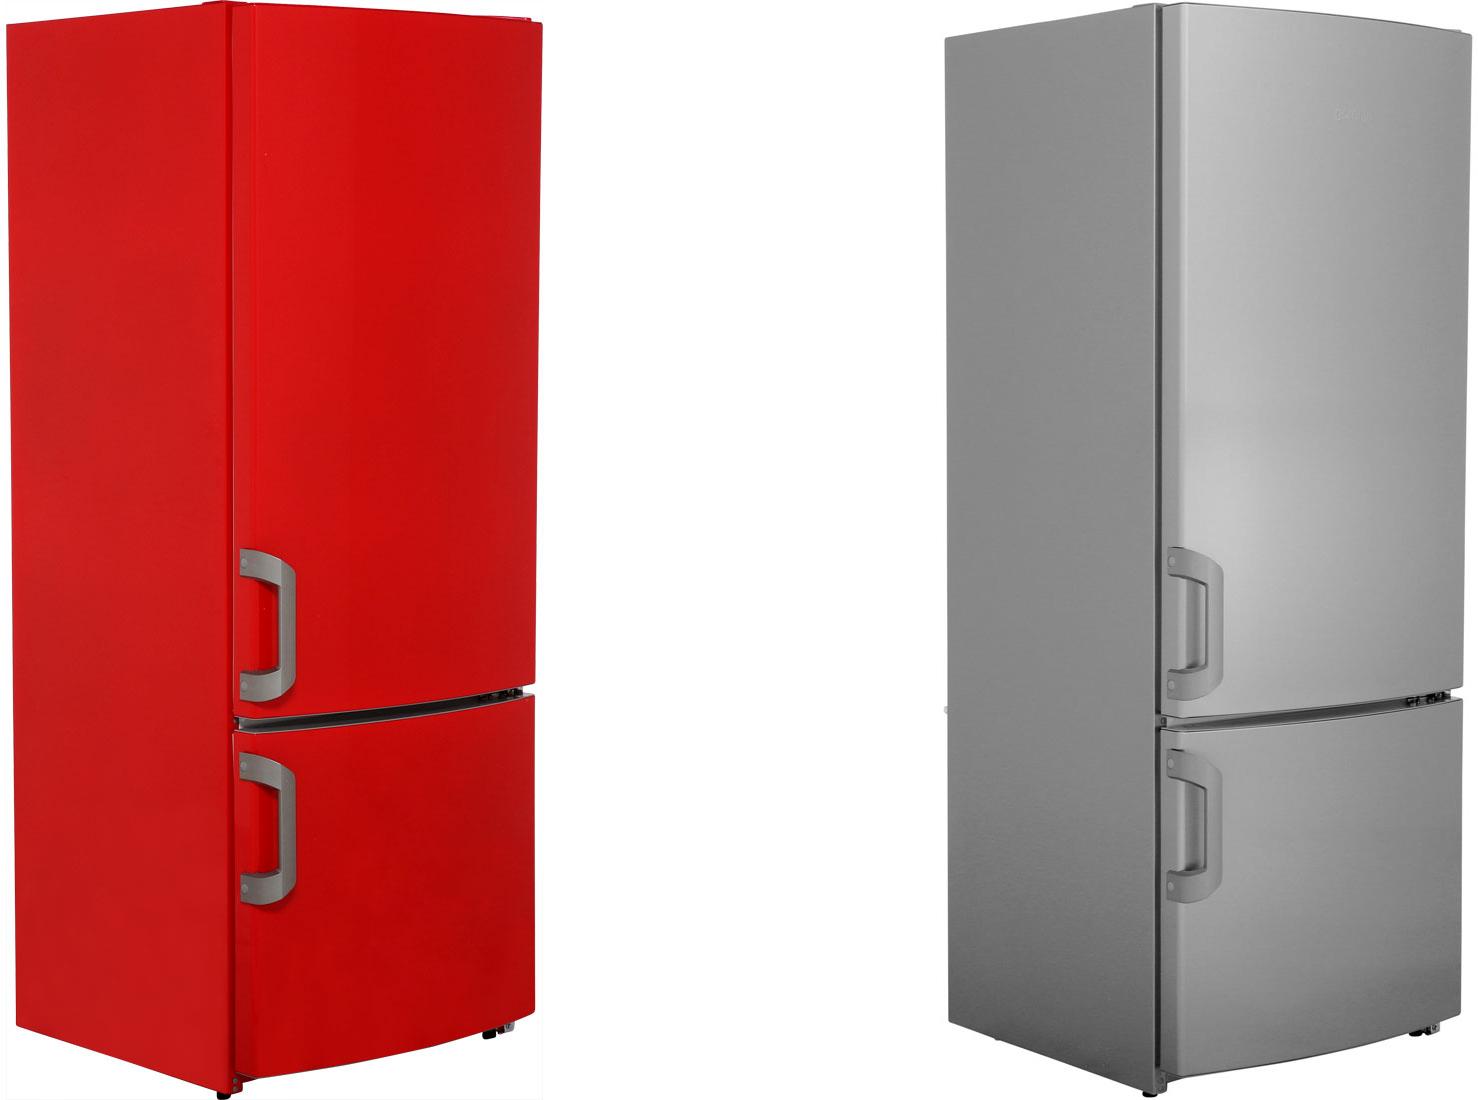 Retro Kühlschrank Rot Gorenje : Gorenje rb ord standkühlschrank rot b ware